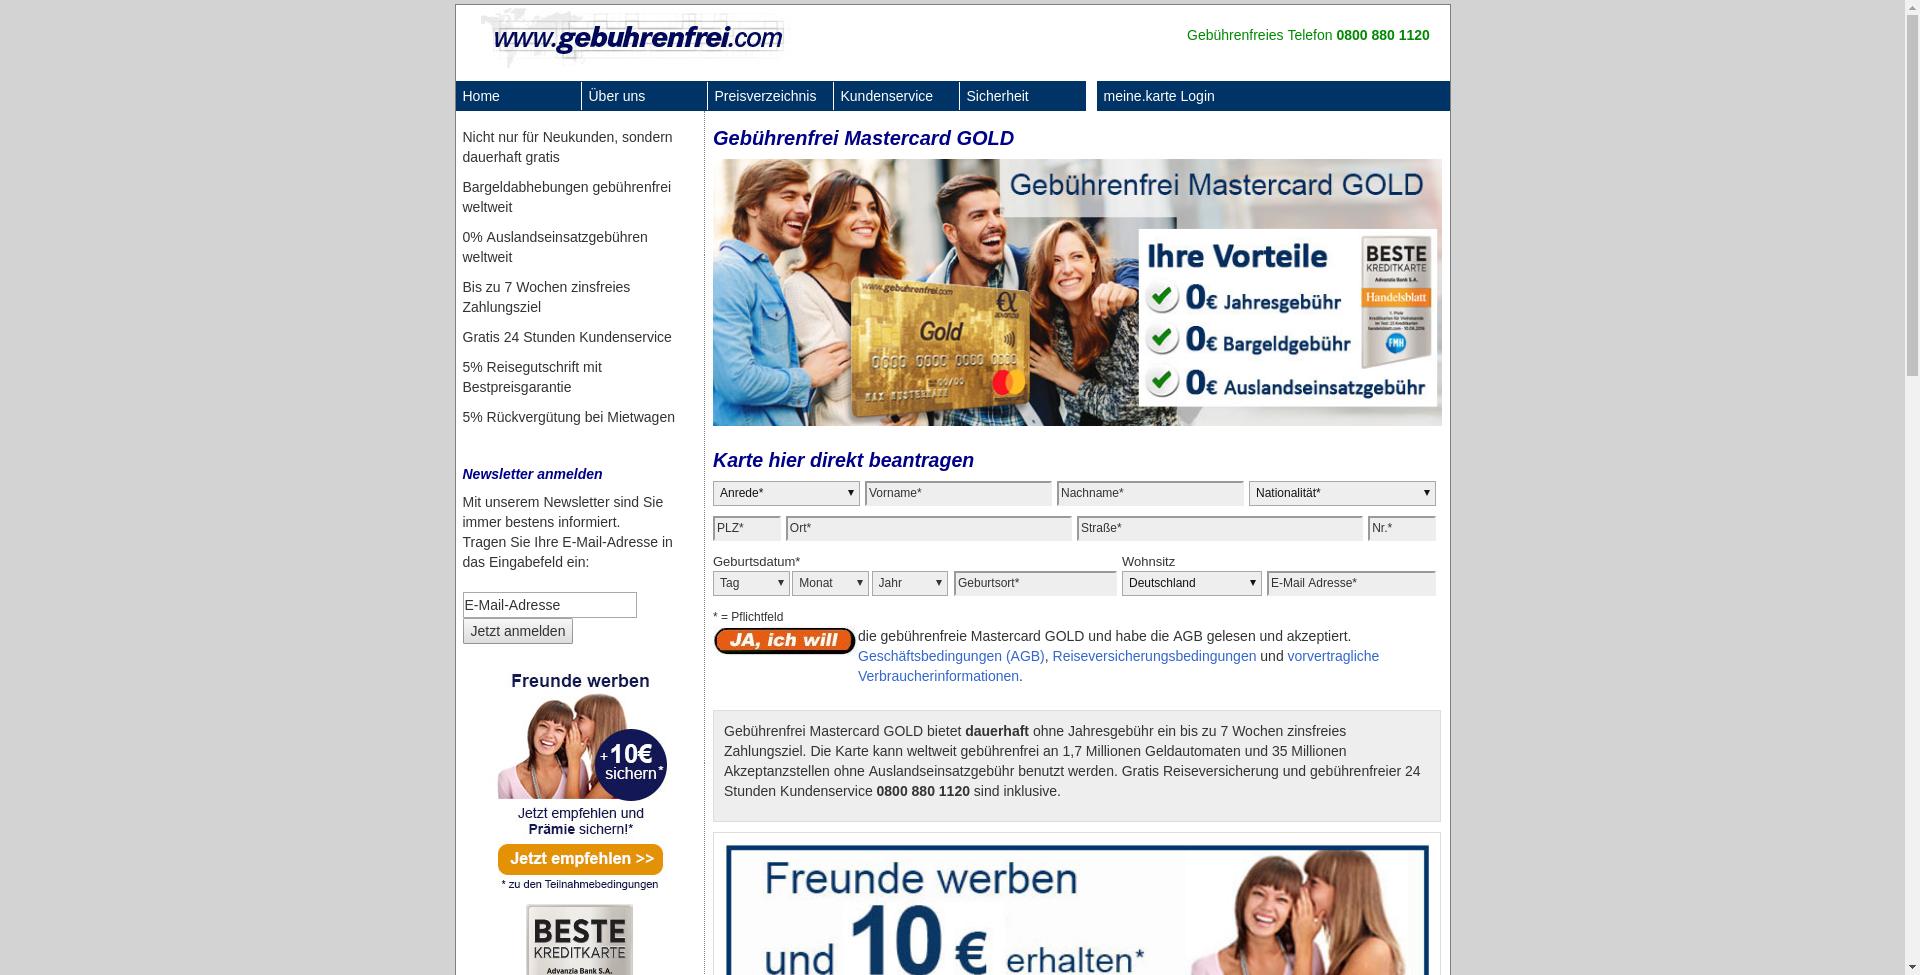 gebuehrenfrei.com